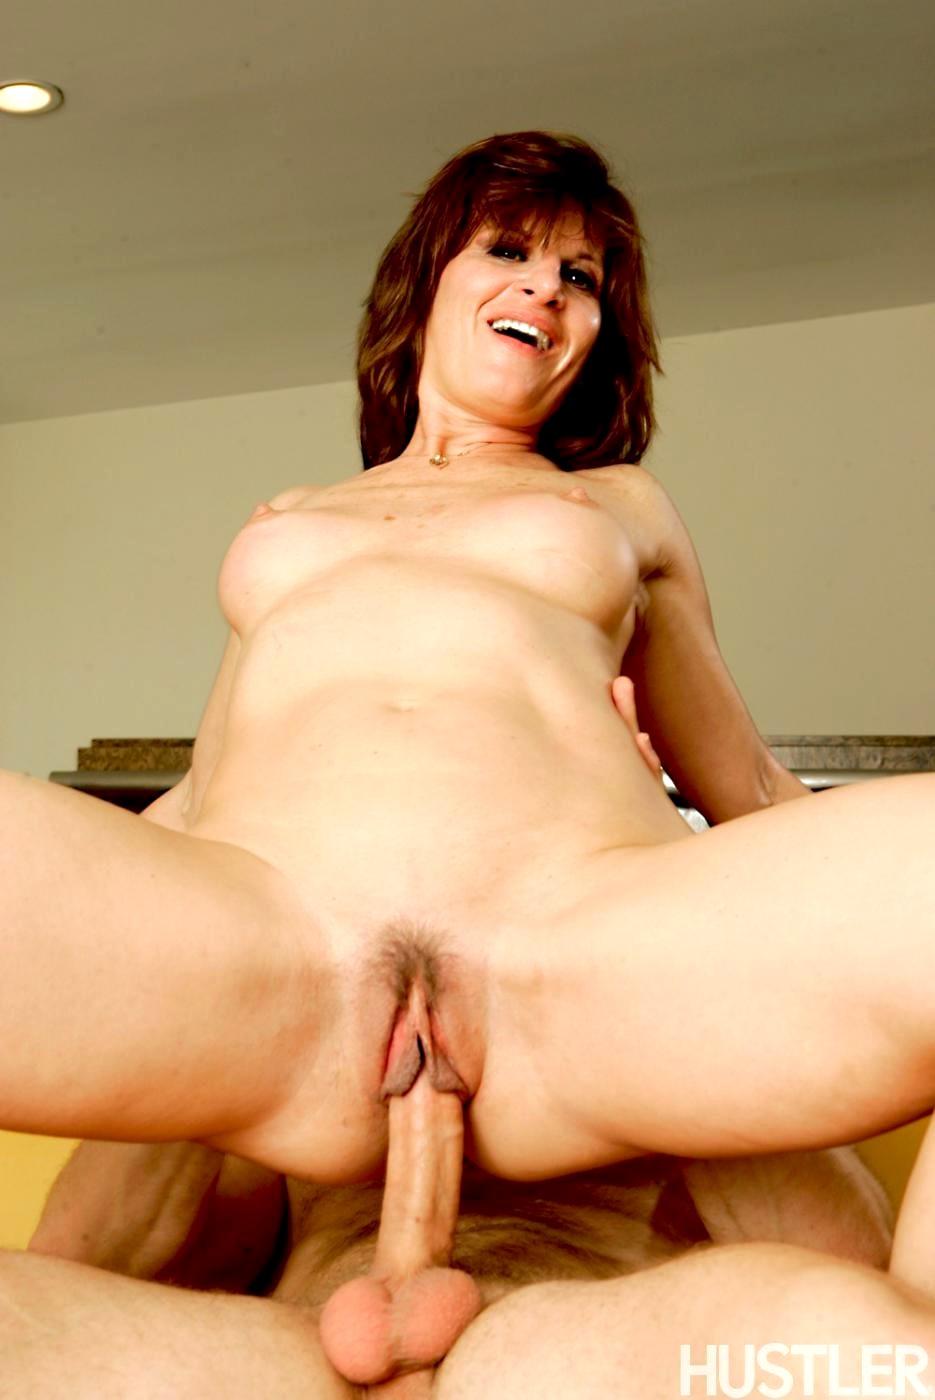 Alicia Loren And Gya Roberts Pictures Porn hustlermegapass linda roberts undermask milf movei mp4 free